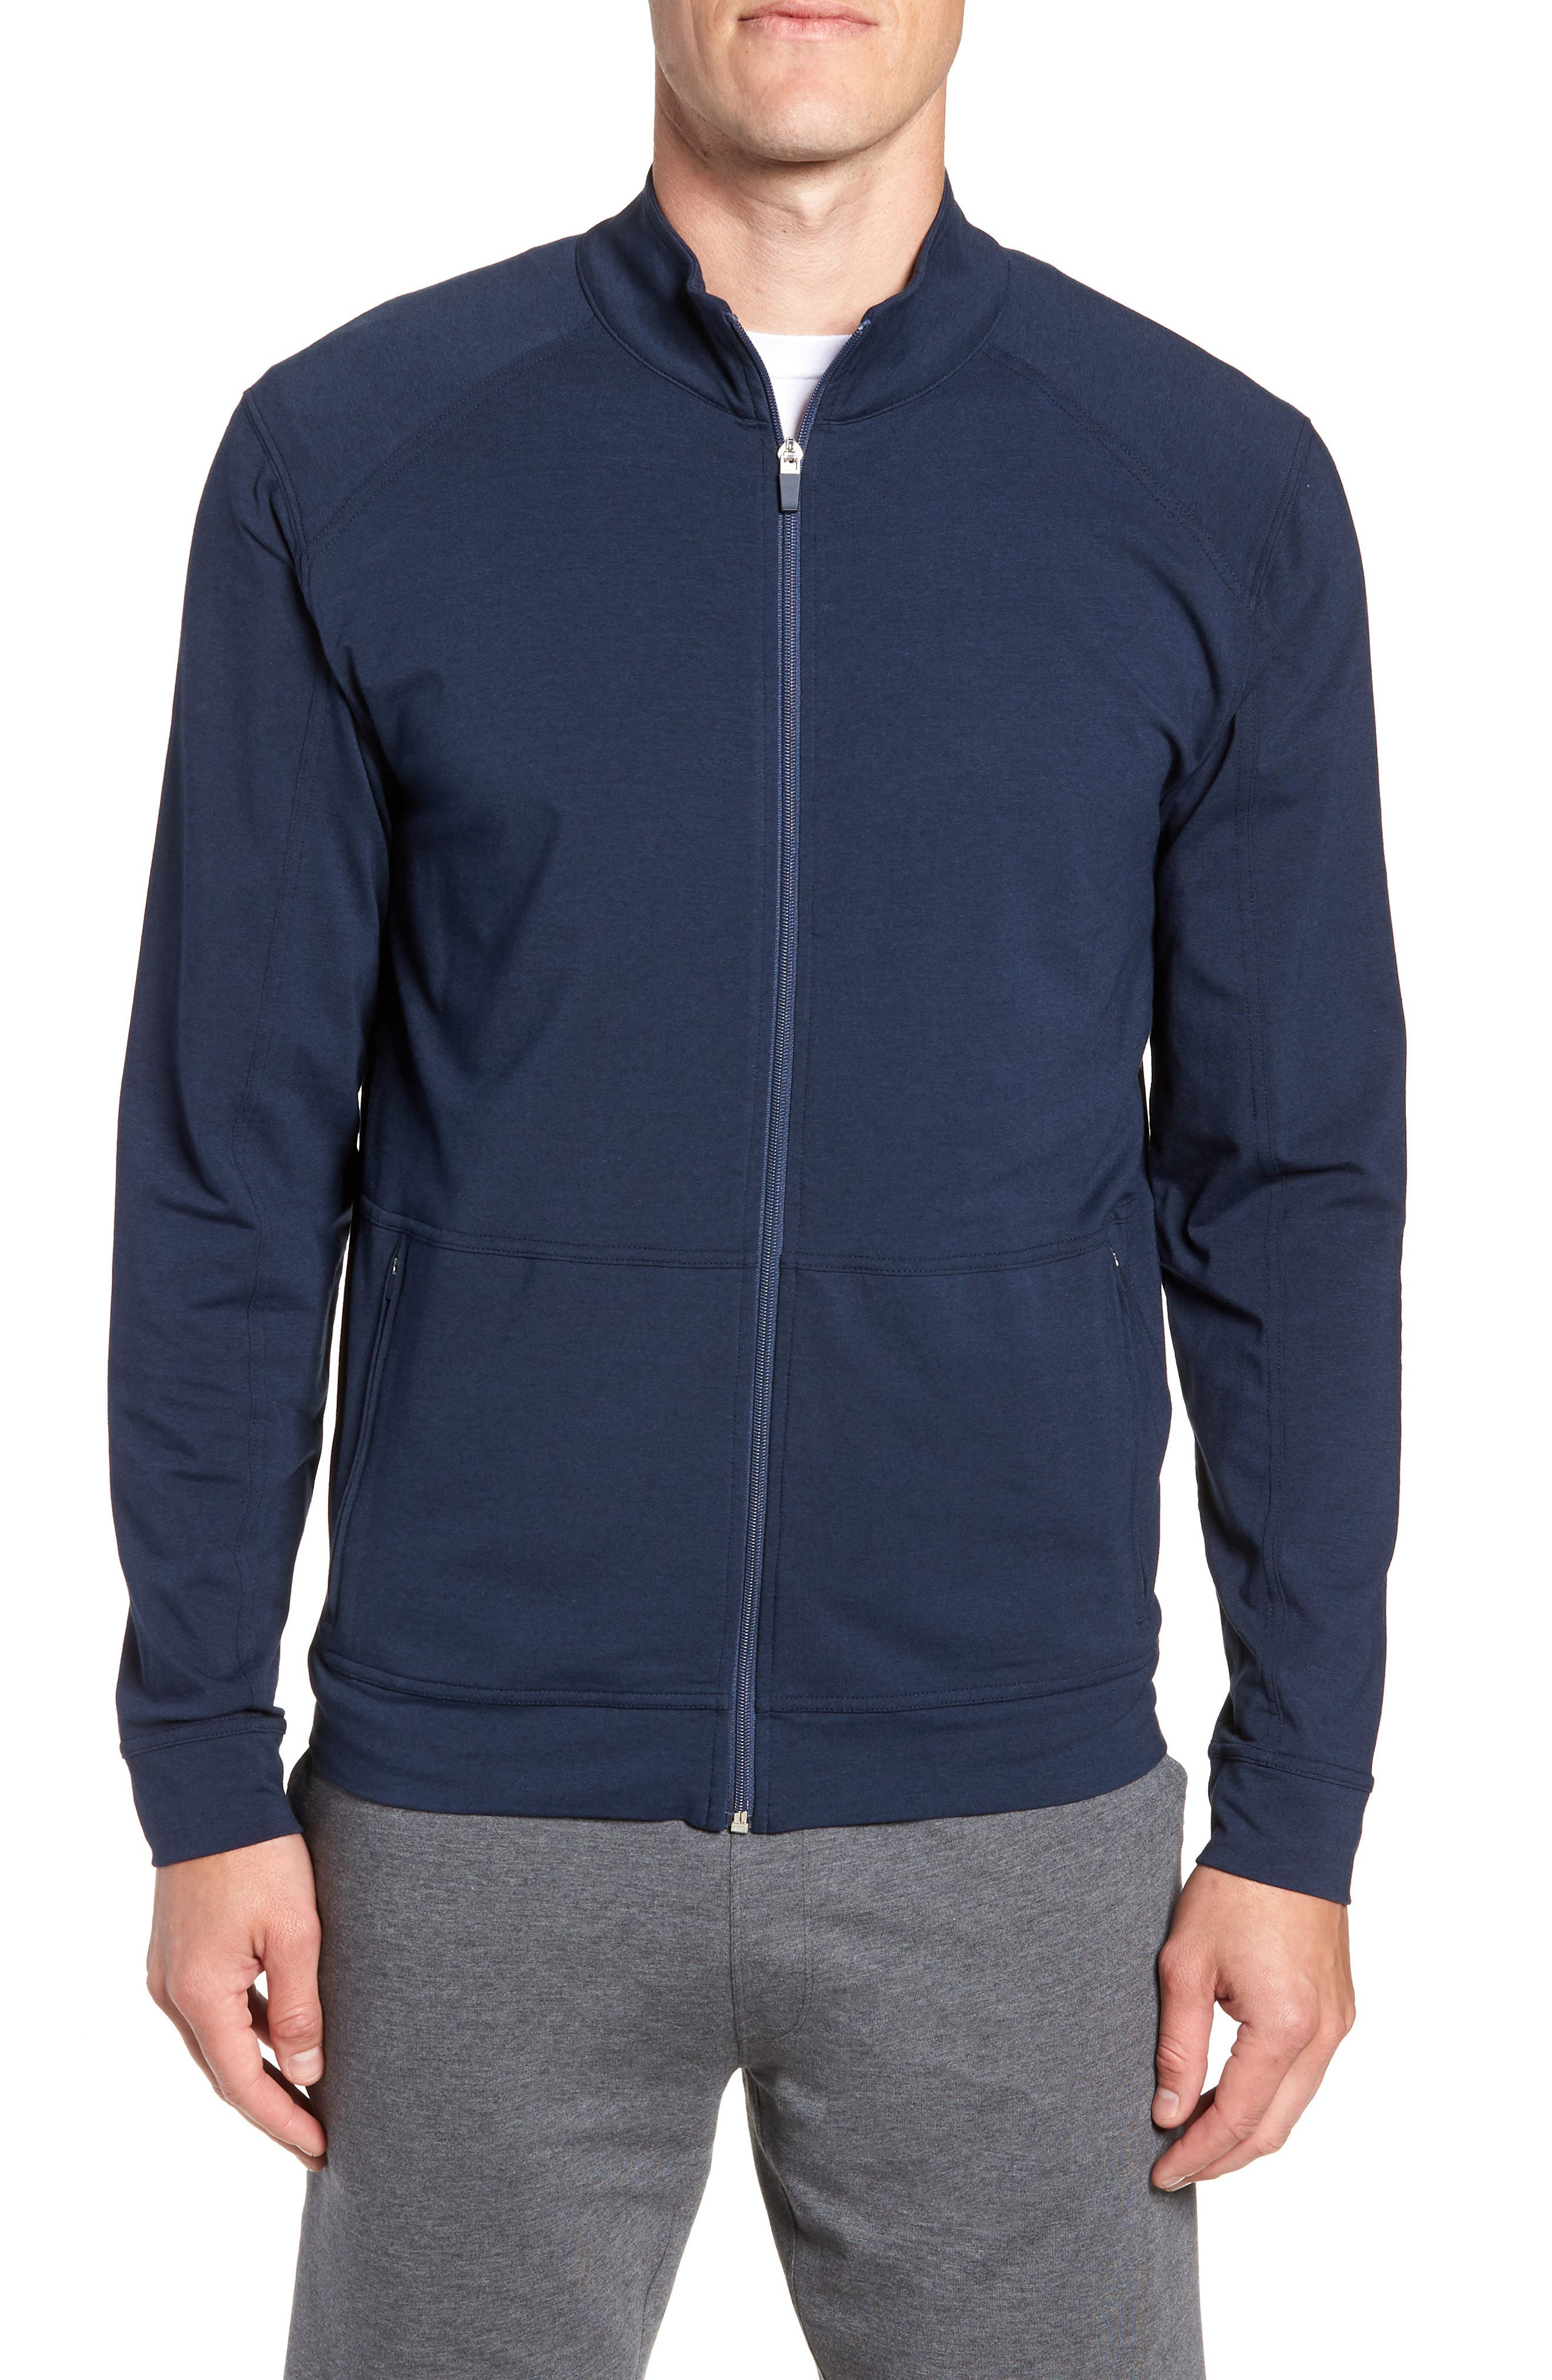 TASC PERFORMANCE Carrollton Zip Jacket, Main, color, CLASSIC NAVY